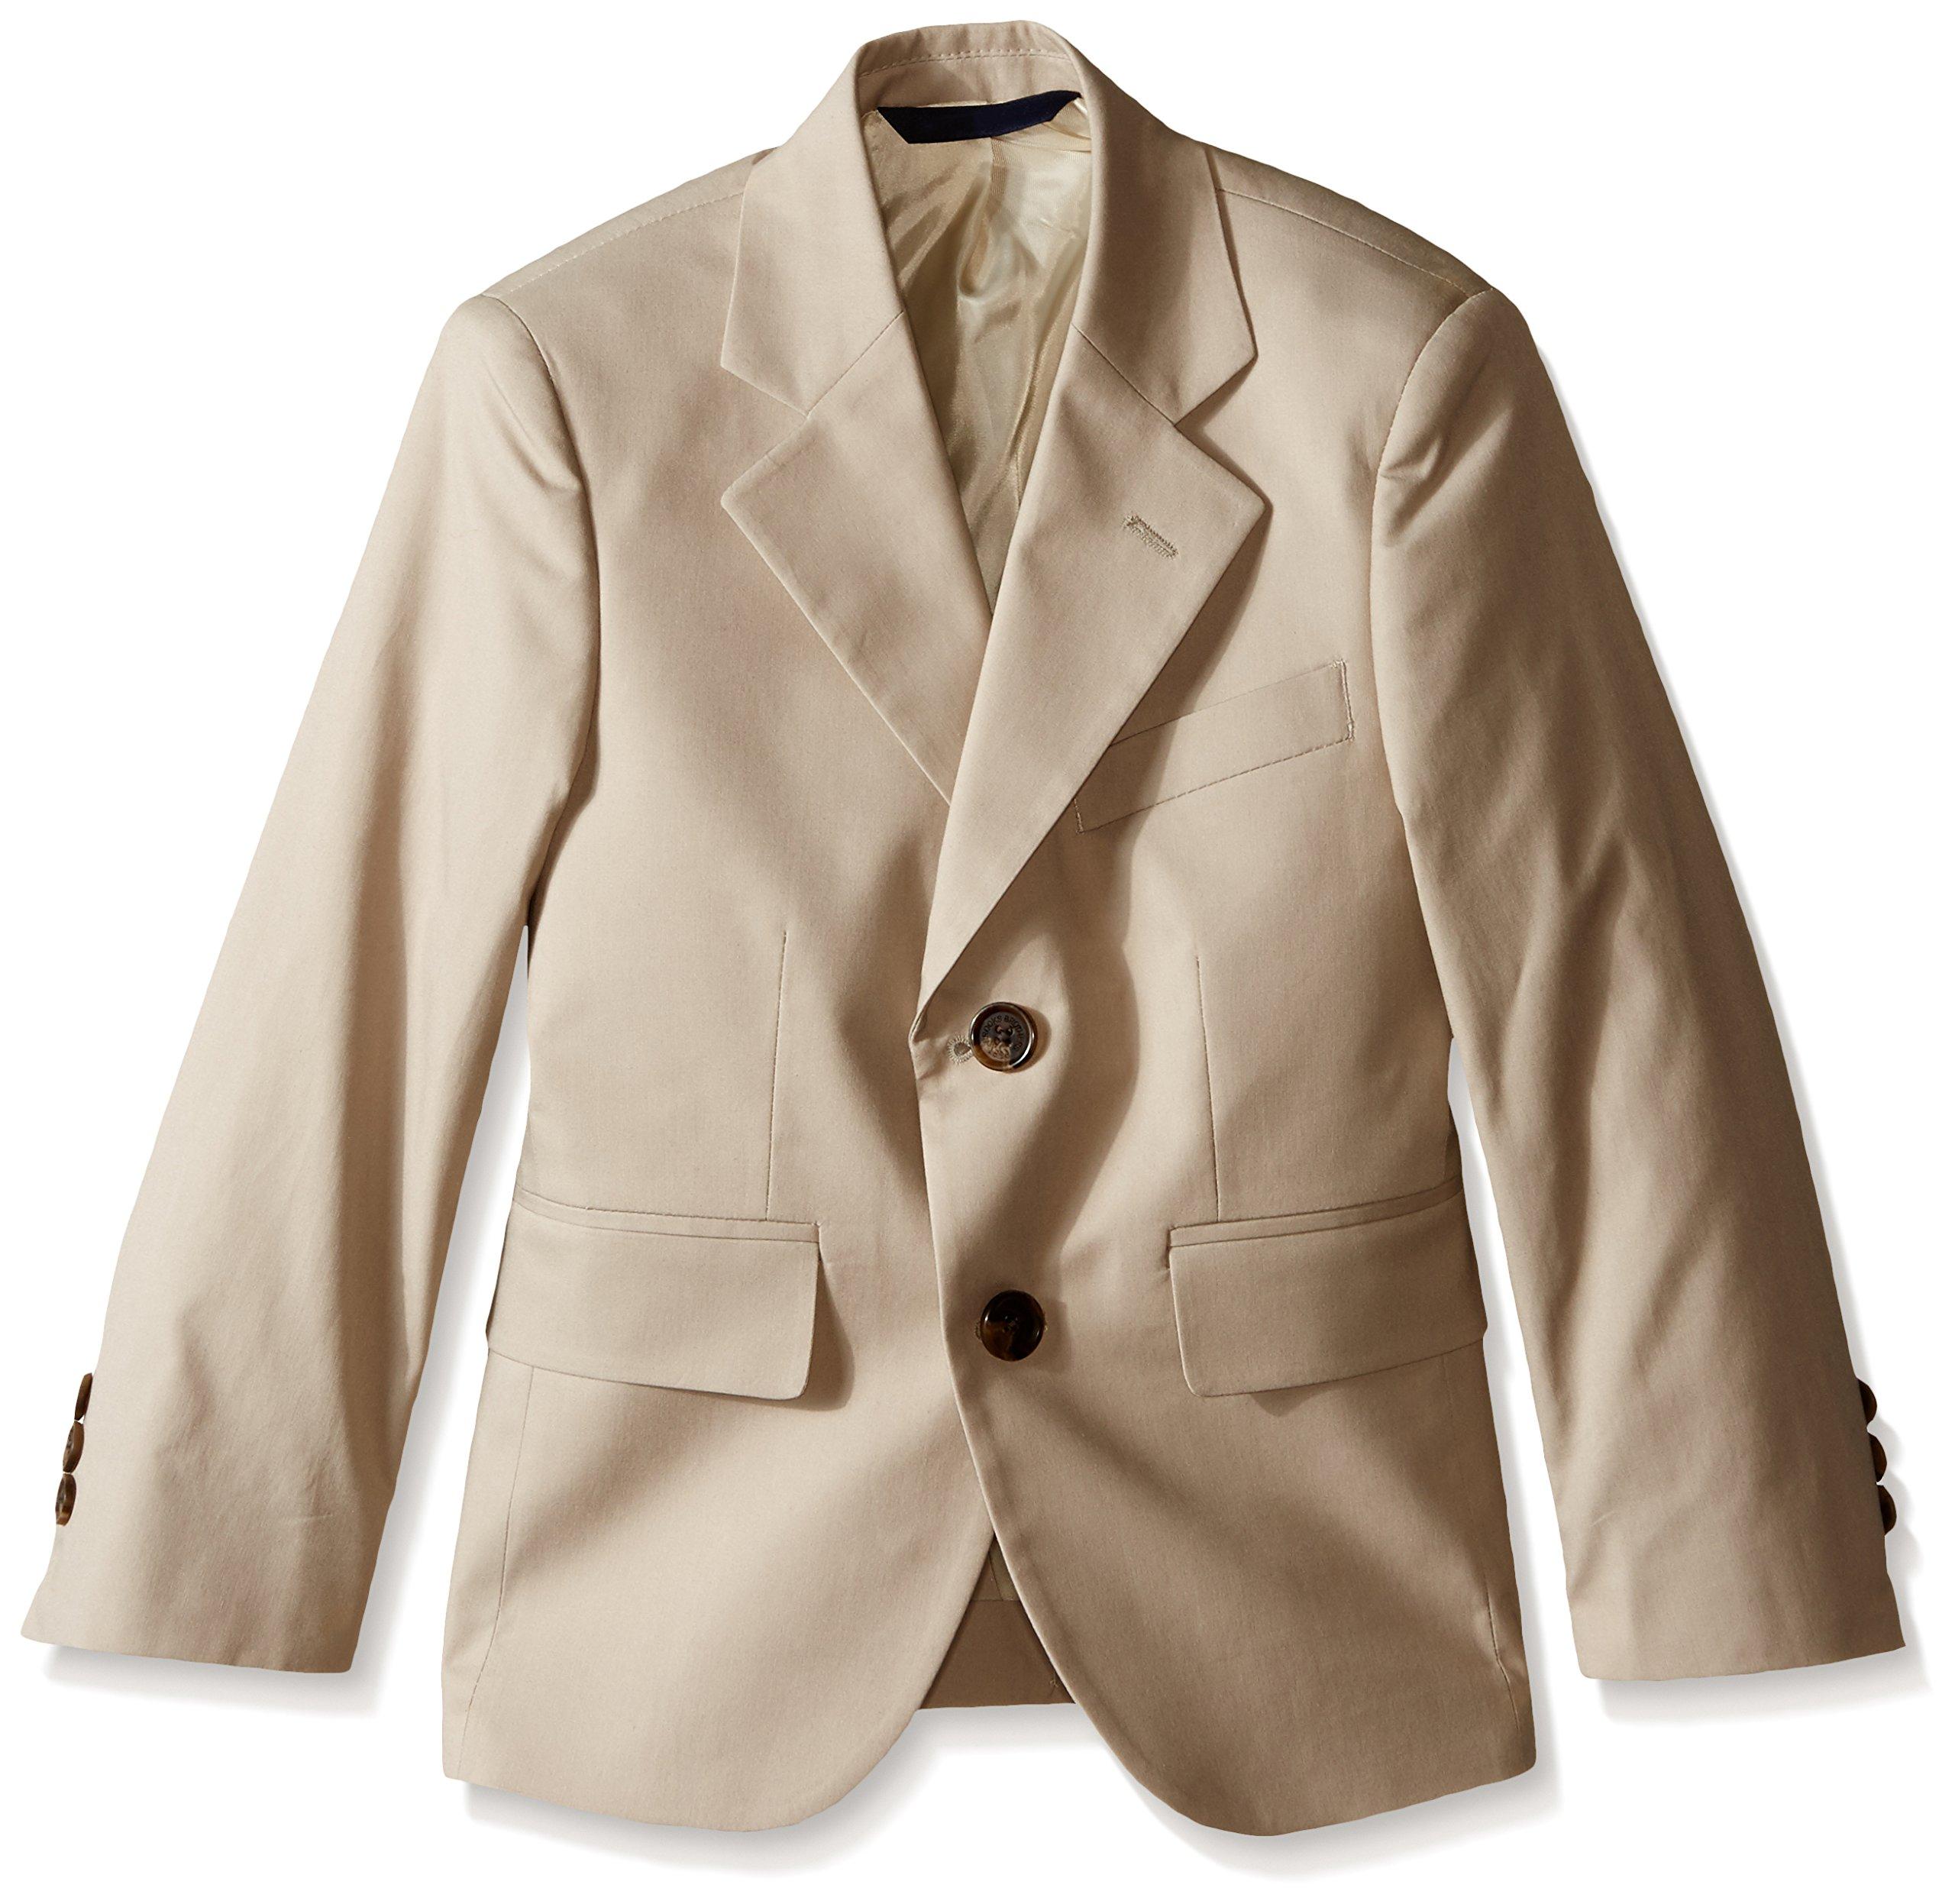 Brooks Brothers Little Boys' Suit Jacket, Khaki, 6 -